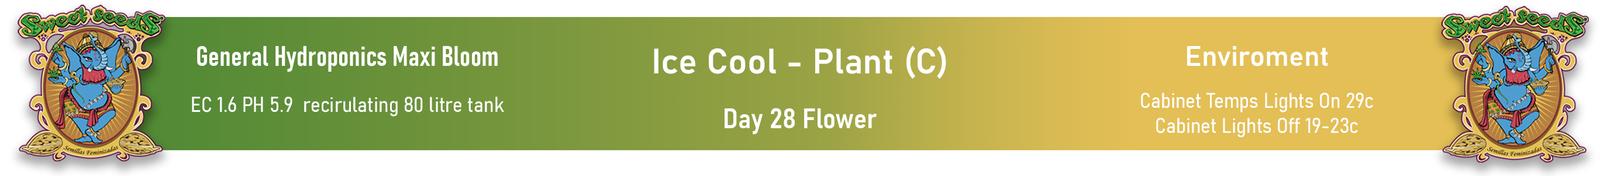 large.601ec5a518609_SweetSeeds-IceCool-PlantC-Day28FlowerInfoPanel-05-02-2021.jpg